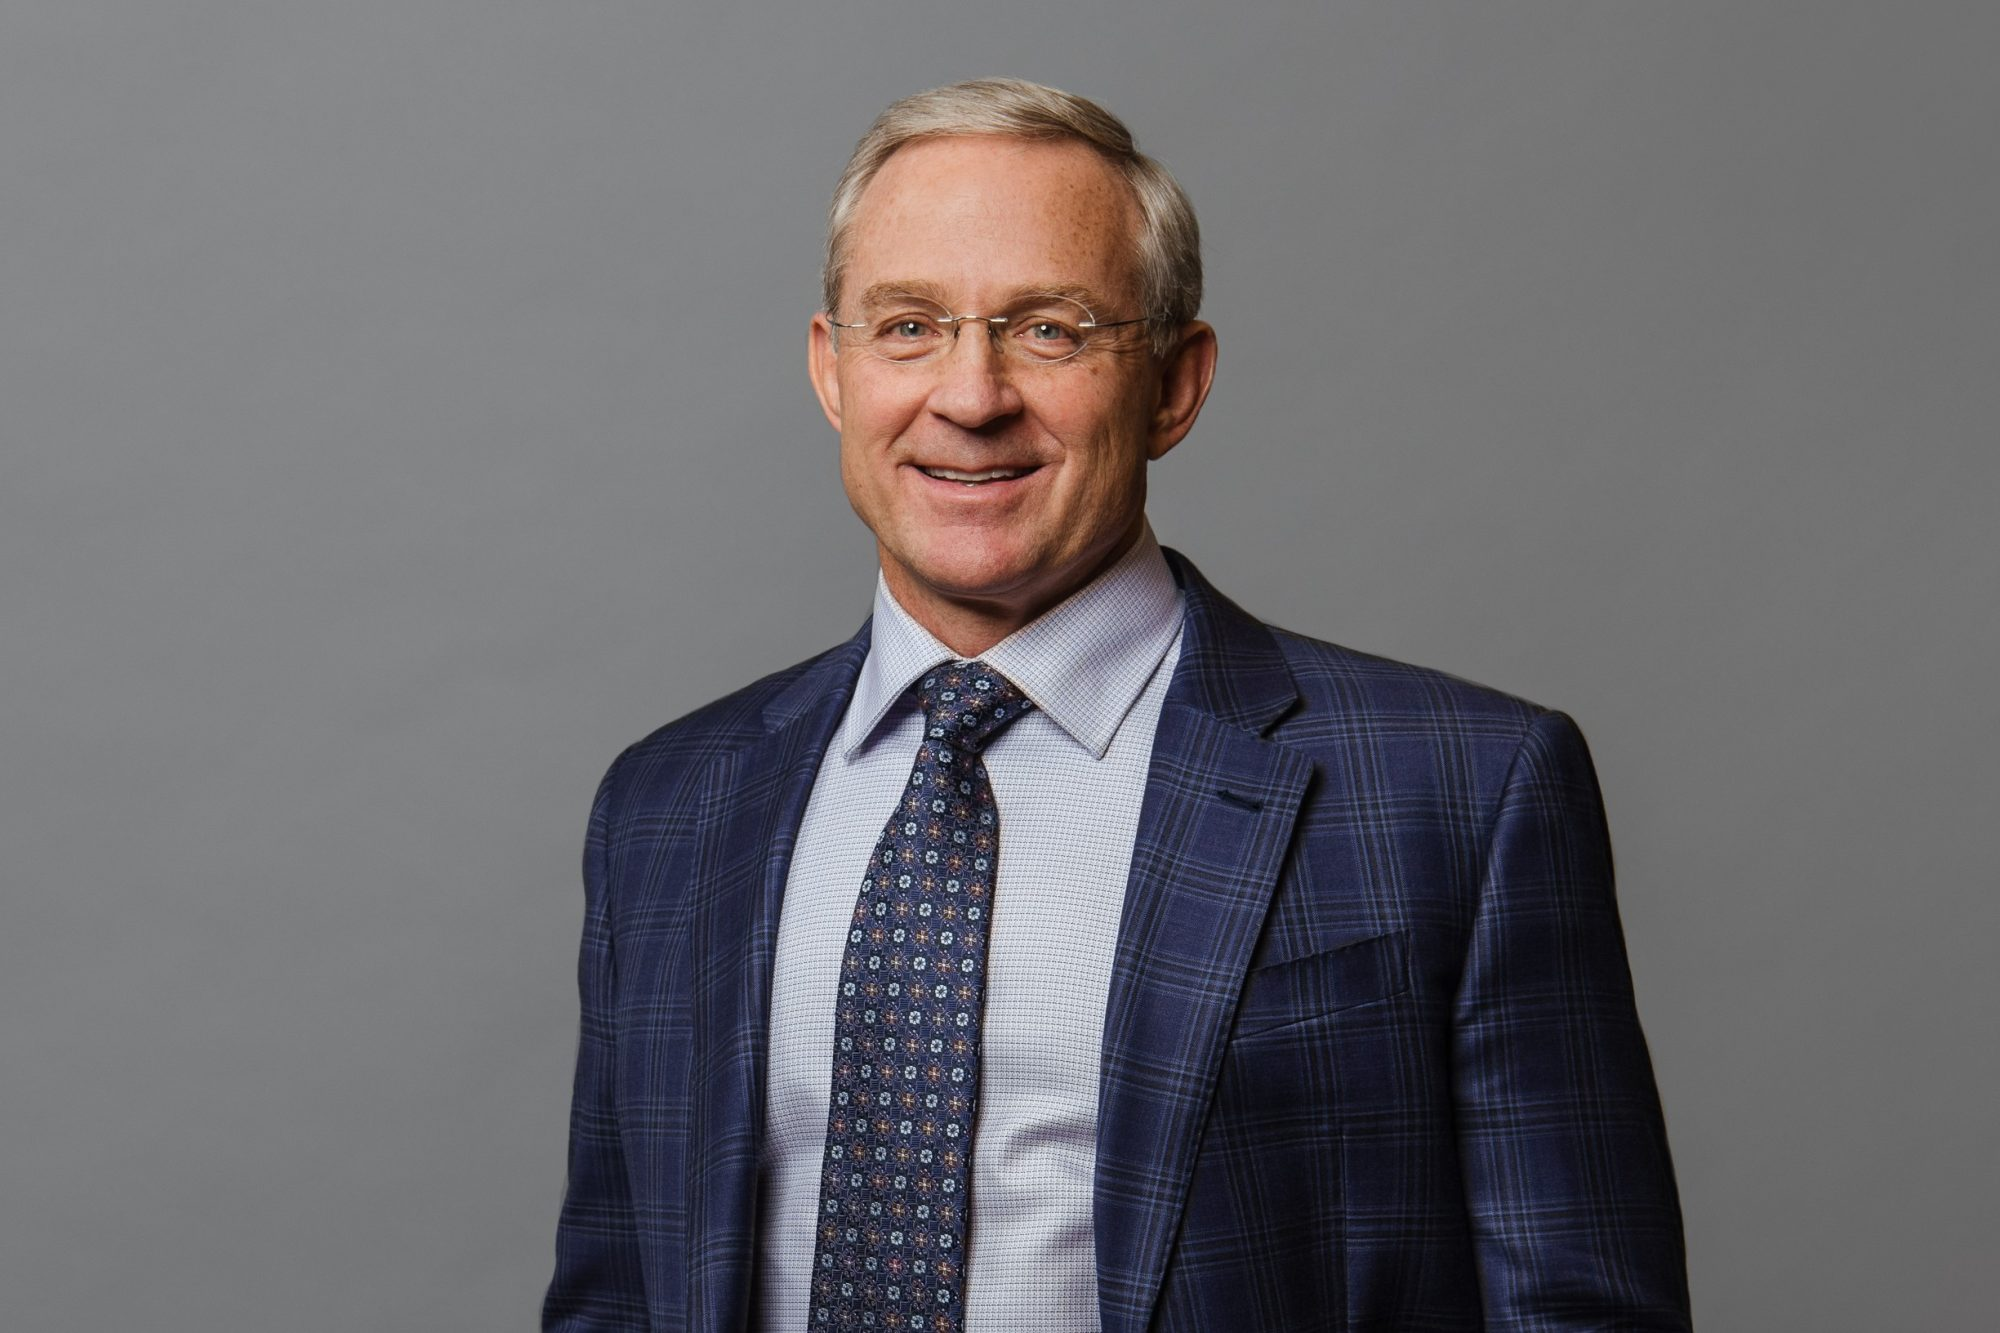 Photo of Kirk Kindsfater, MD